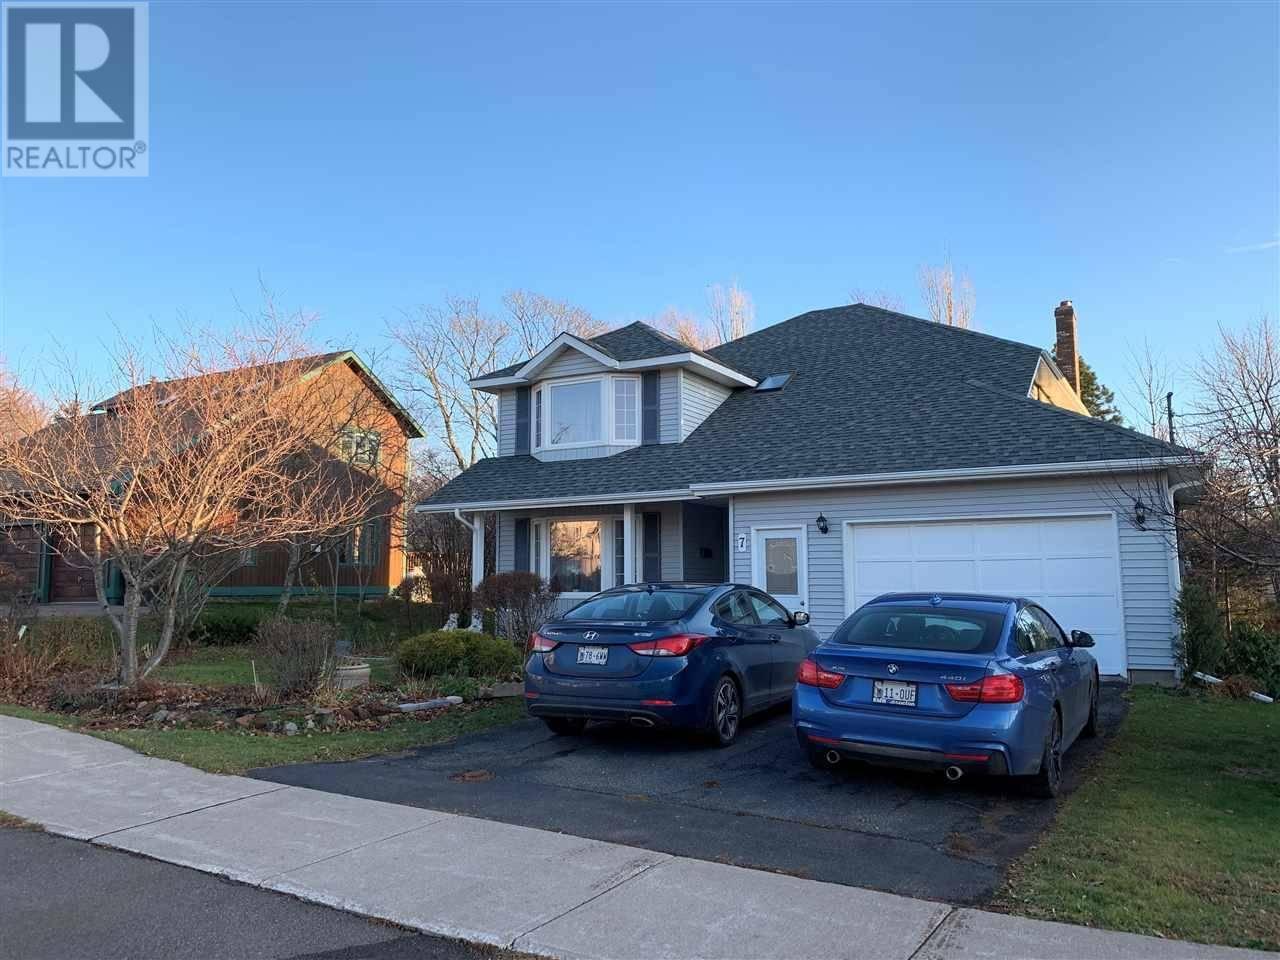 House for sale at 7 Ash Dr Sherwood Prince Edward Island - MLS: 201926698